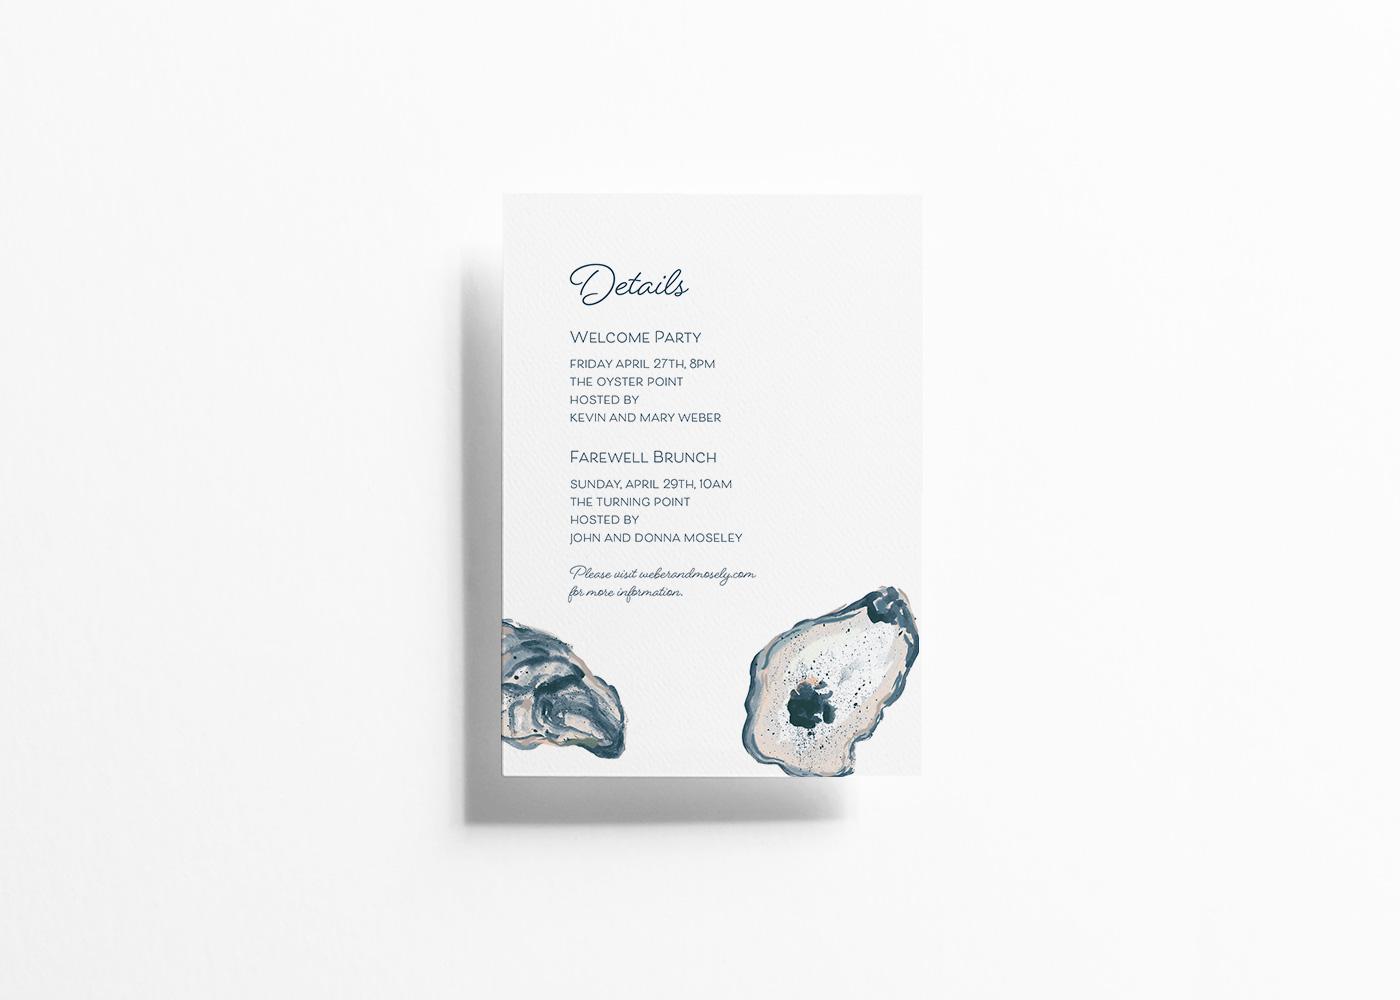 LoveLore_A6-Details-Card_SP18_BlushingTide.jpg